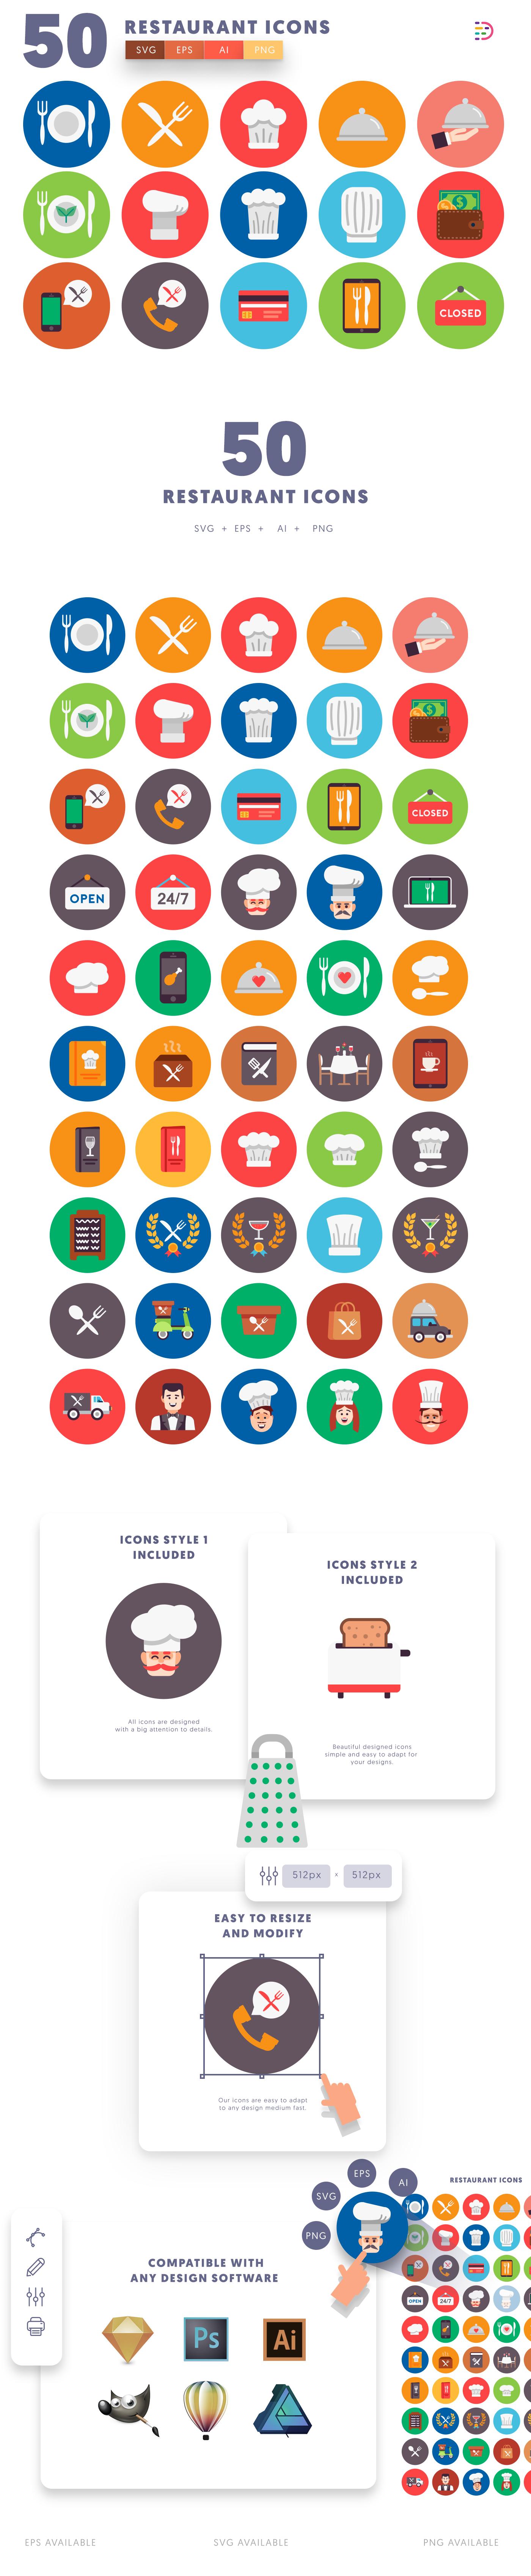 50 Restaurant Icons list